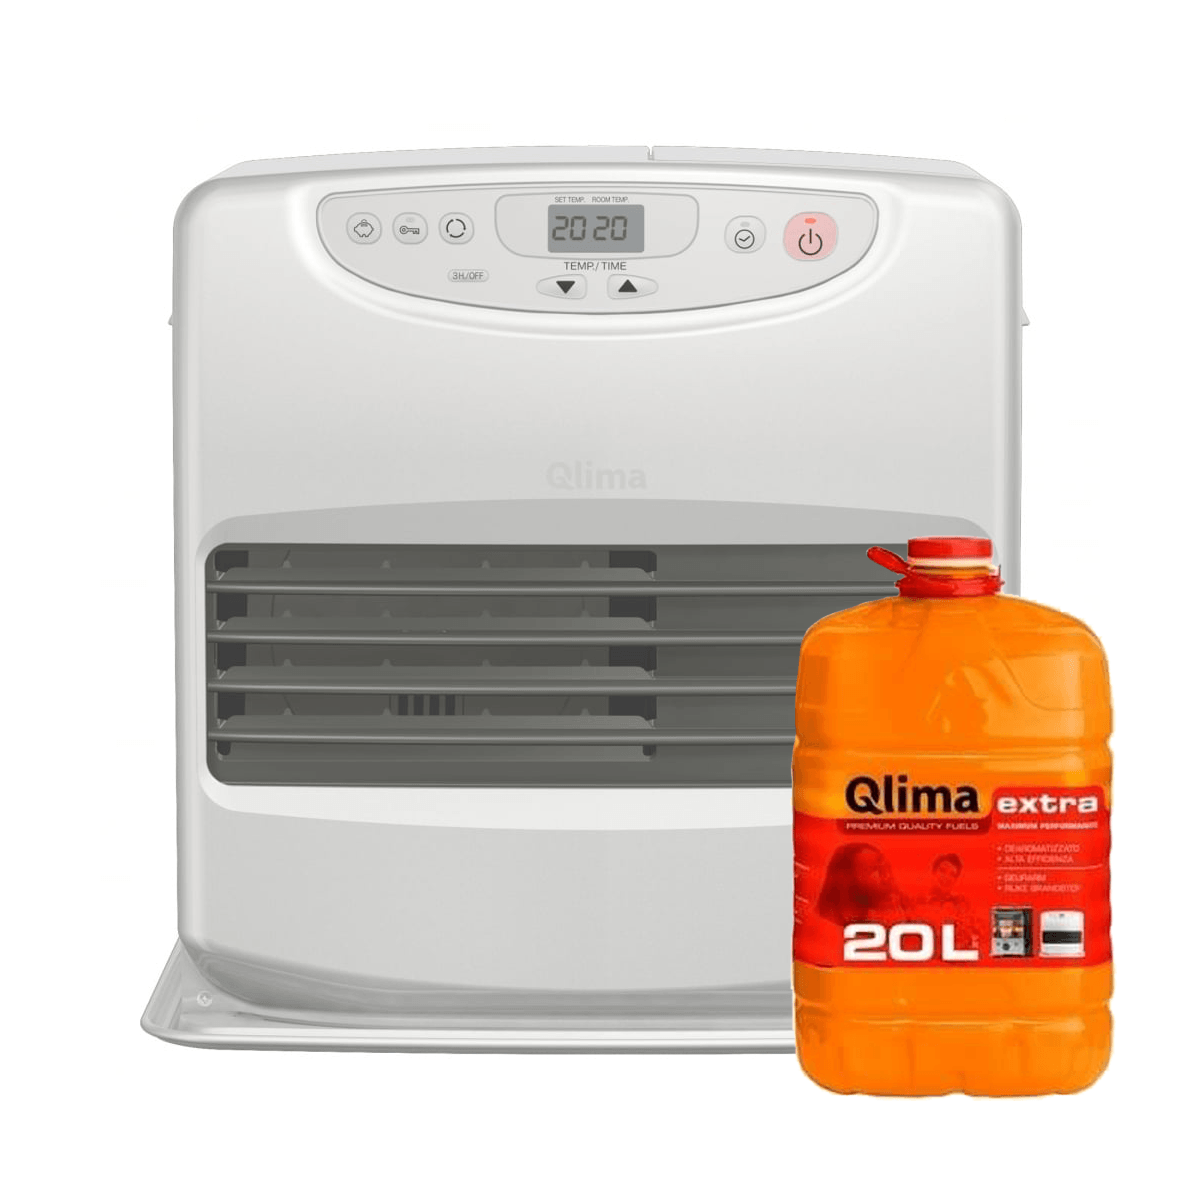 Qlima SRE 8040C Laserkachel + Gratis 20 Ltr Extra Brandstof Qlima > Verwarming » Petroleum kachels > Kachels / verwarming